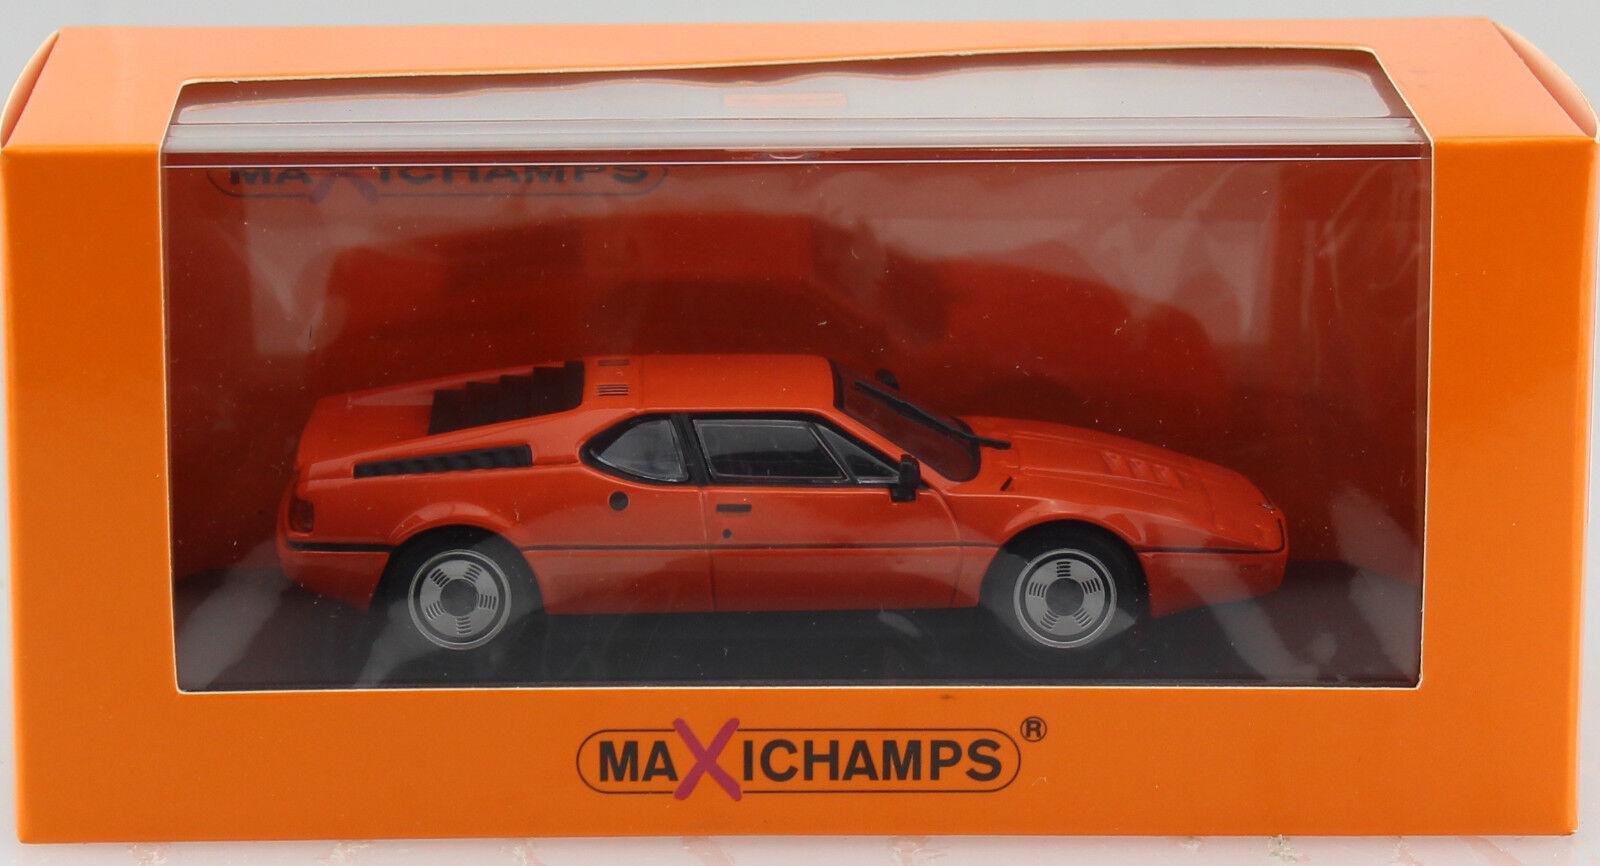 Bmw Bmw Bmw m1 1979 naranja 1 43 maxichamps maqueta de coche 940025020 c83e03